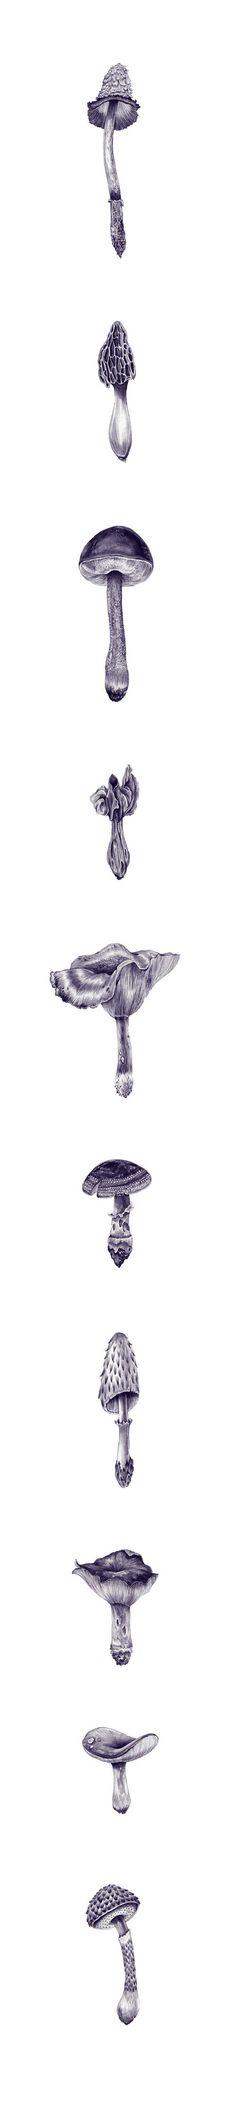 Drawings by Eibatova Karina.